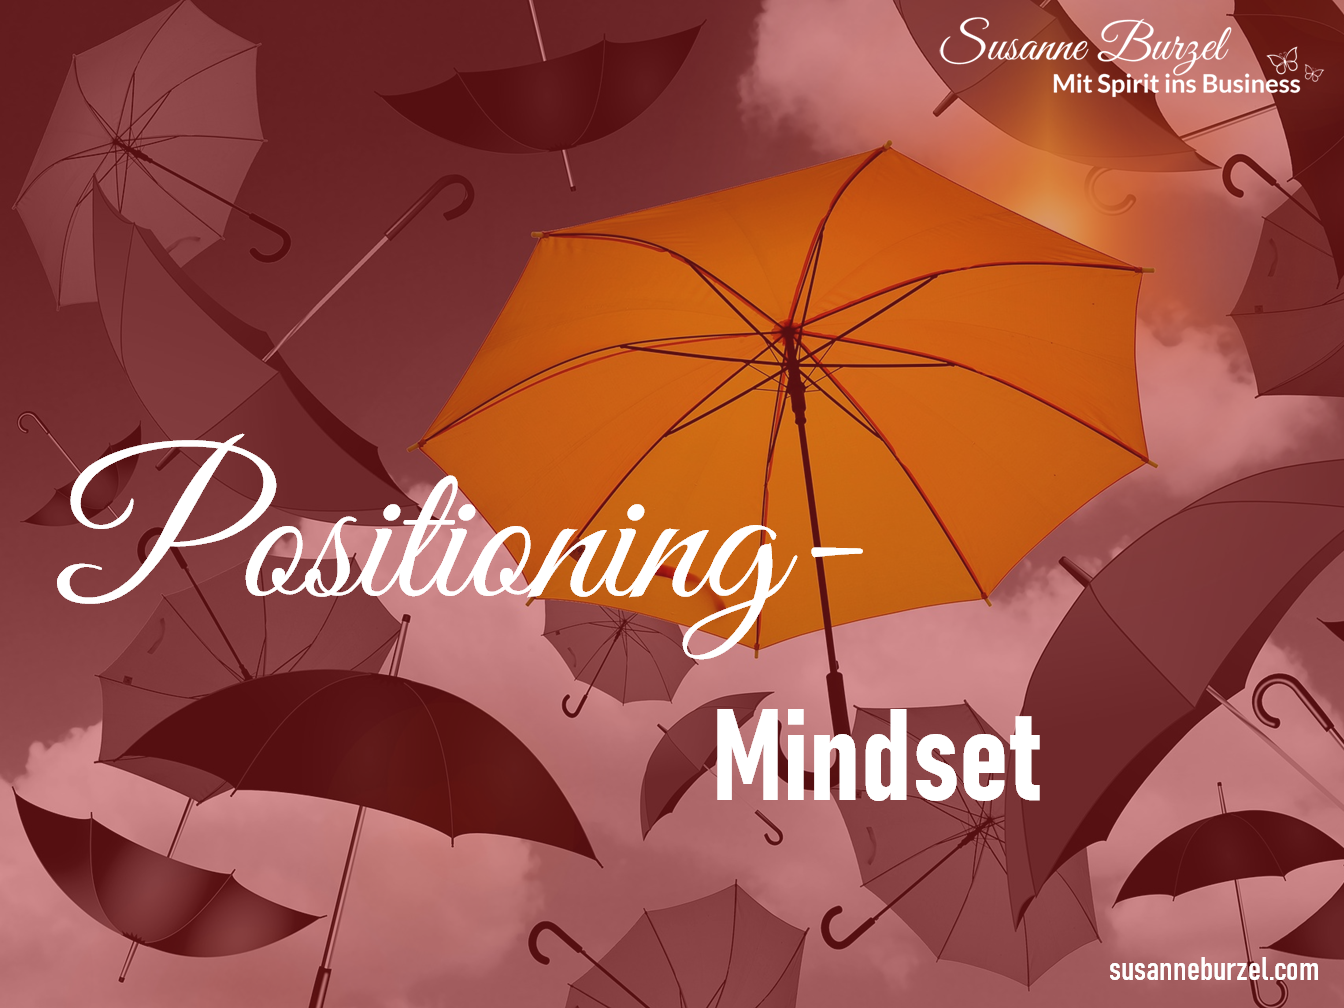 Positioning Mindset